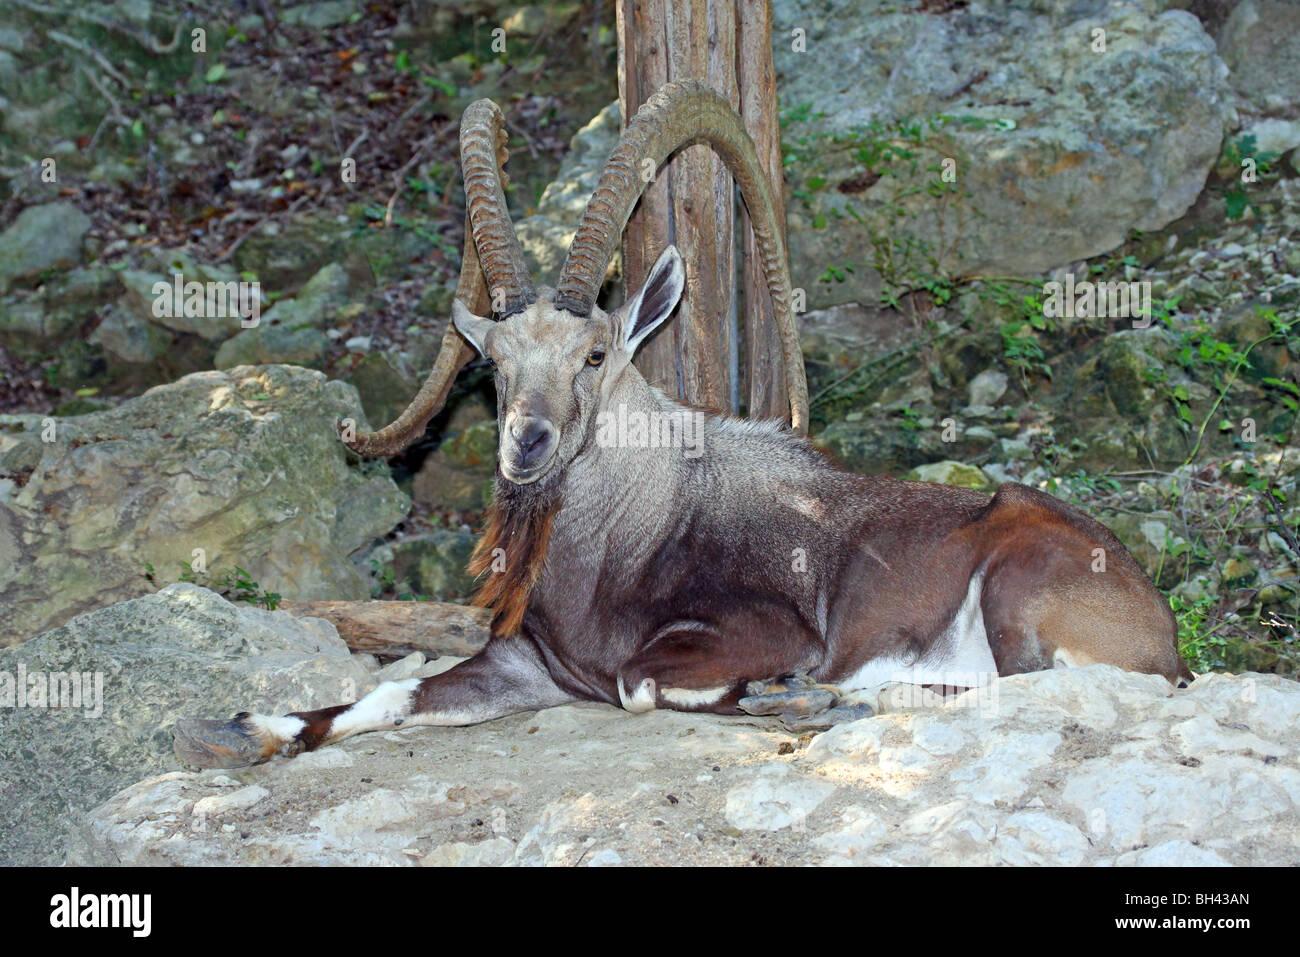 Nubian Ibex - Stock Image